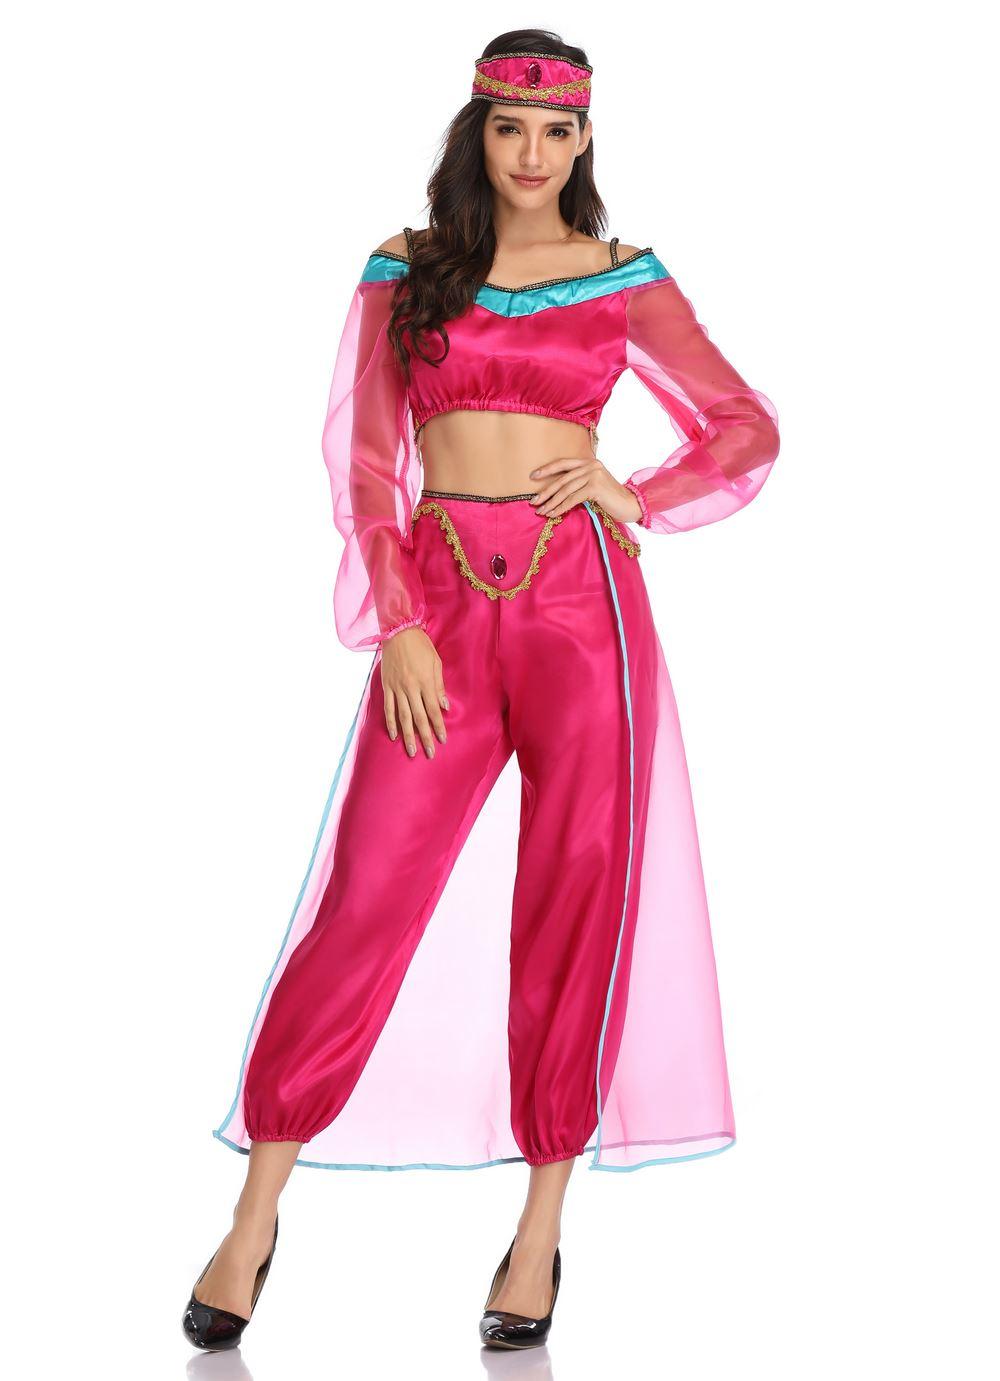 Aladdin Princess Jasmine Costume Tops Pants Headband On Sale For